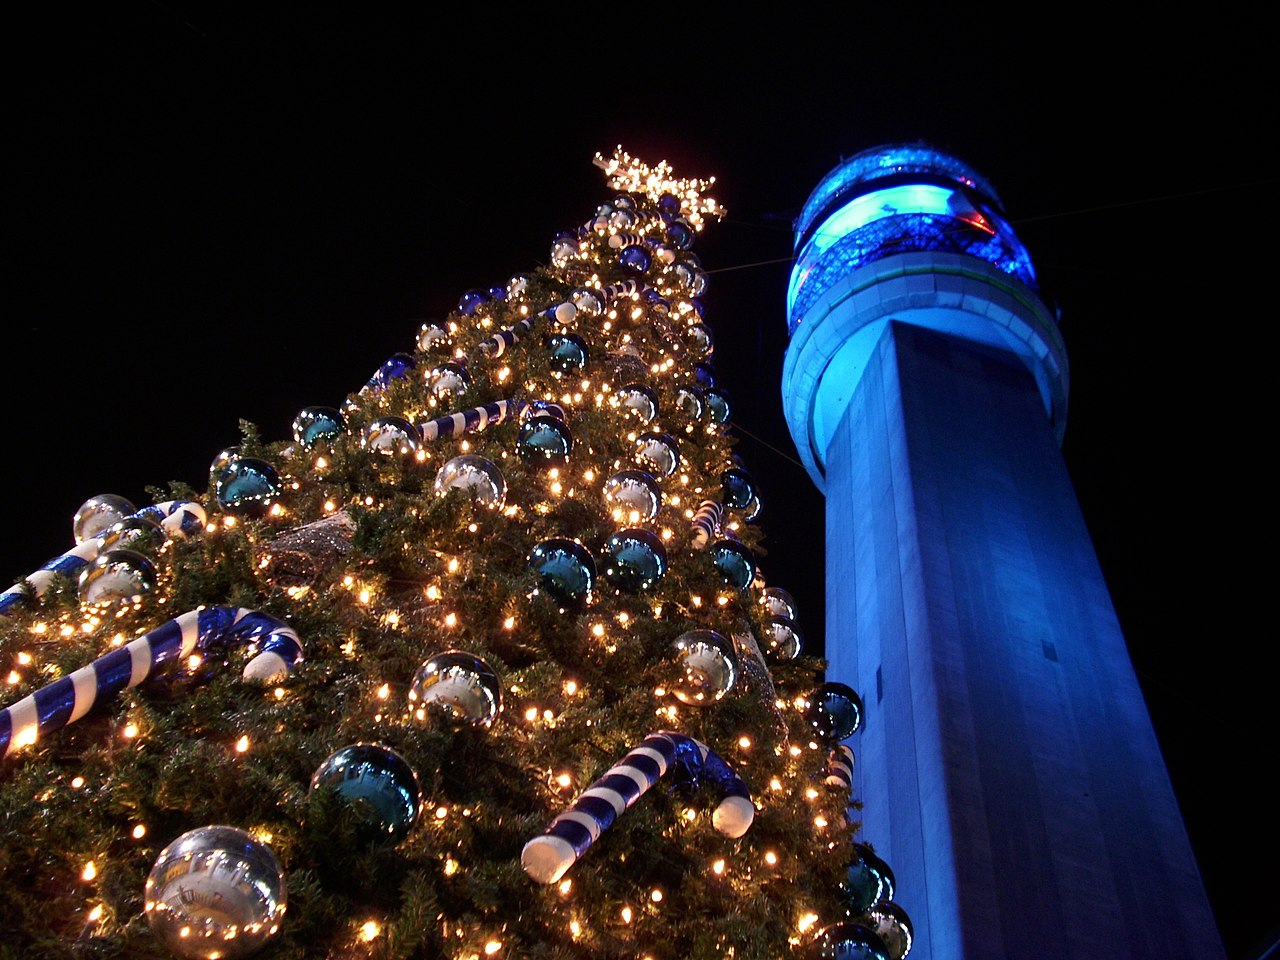 File:Árbol Navidad Torre Entel Chile.jpg - Wikimedia Commons